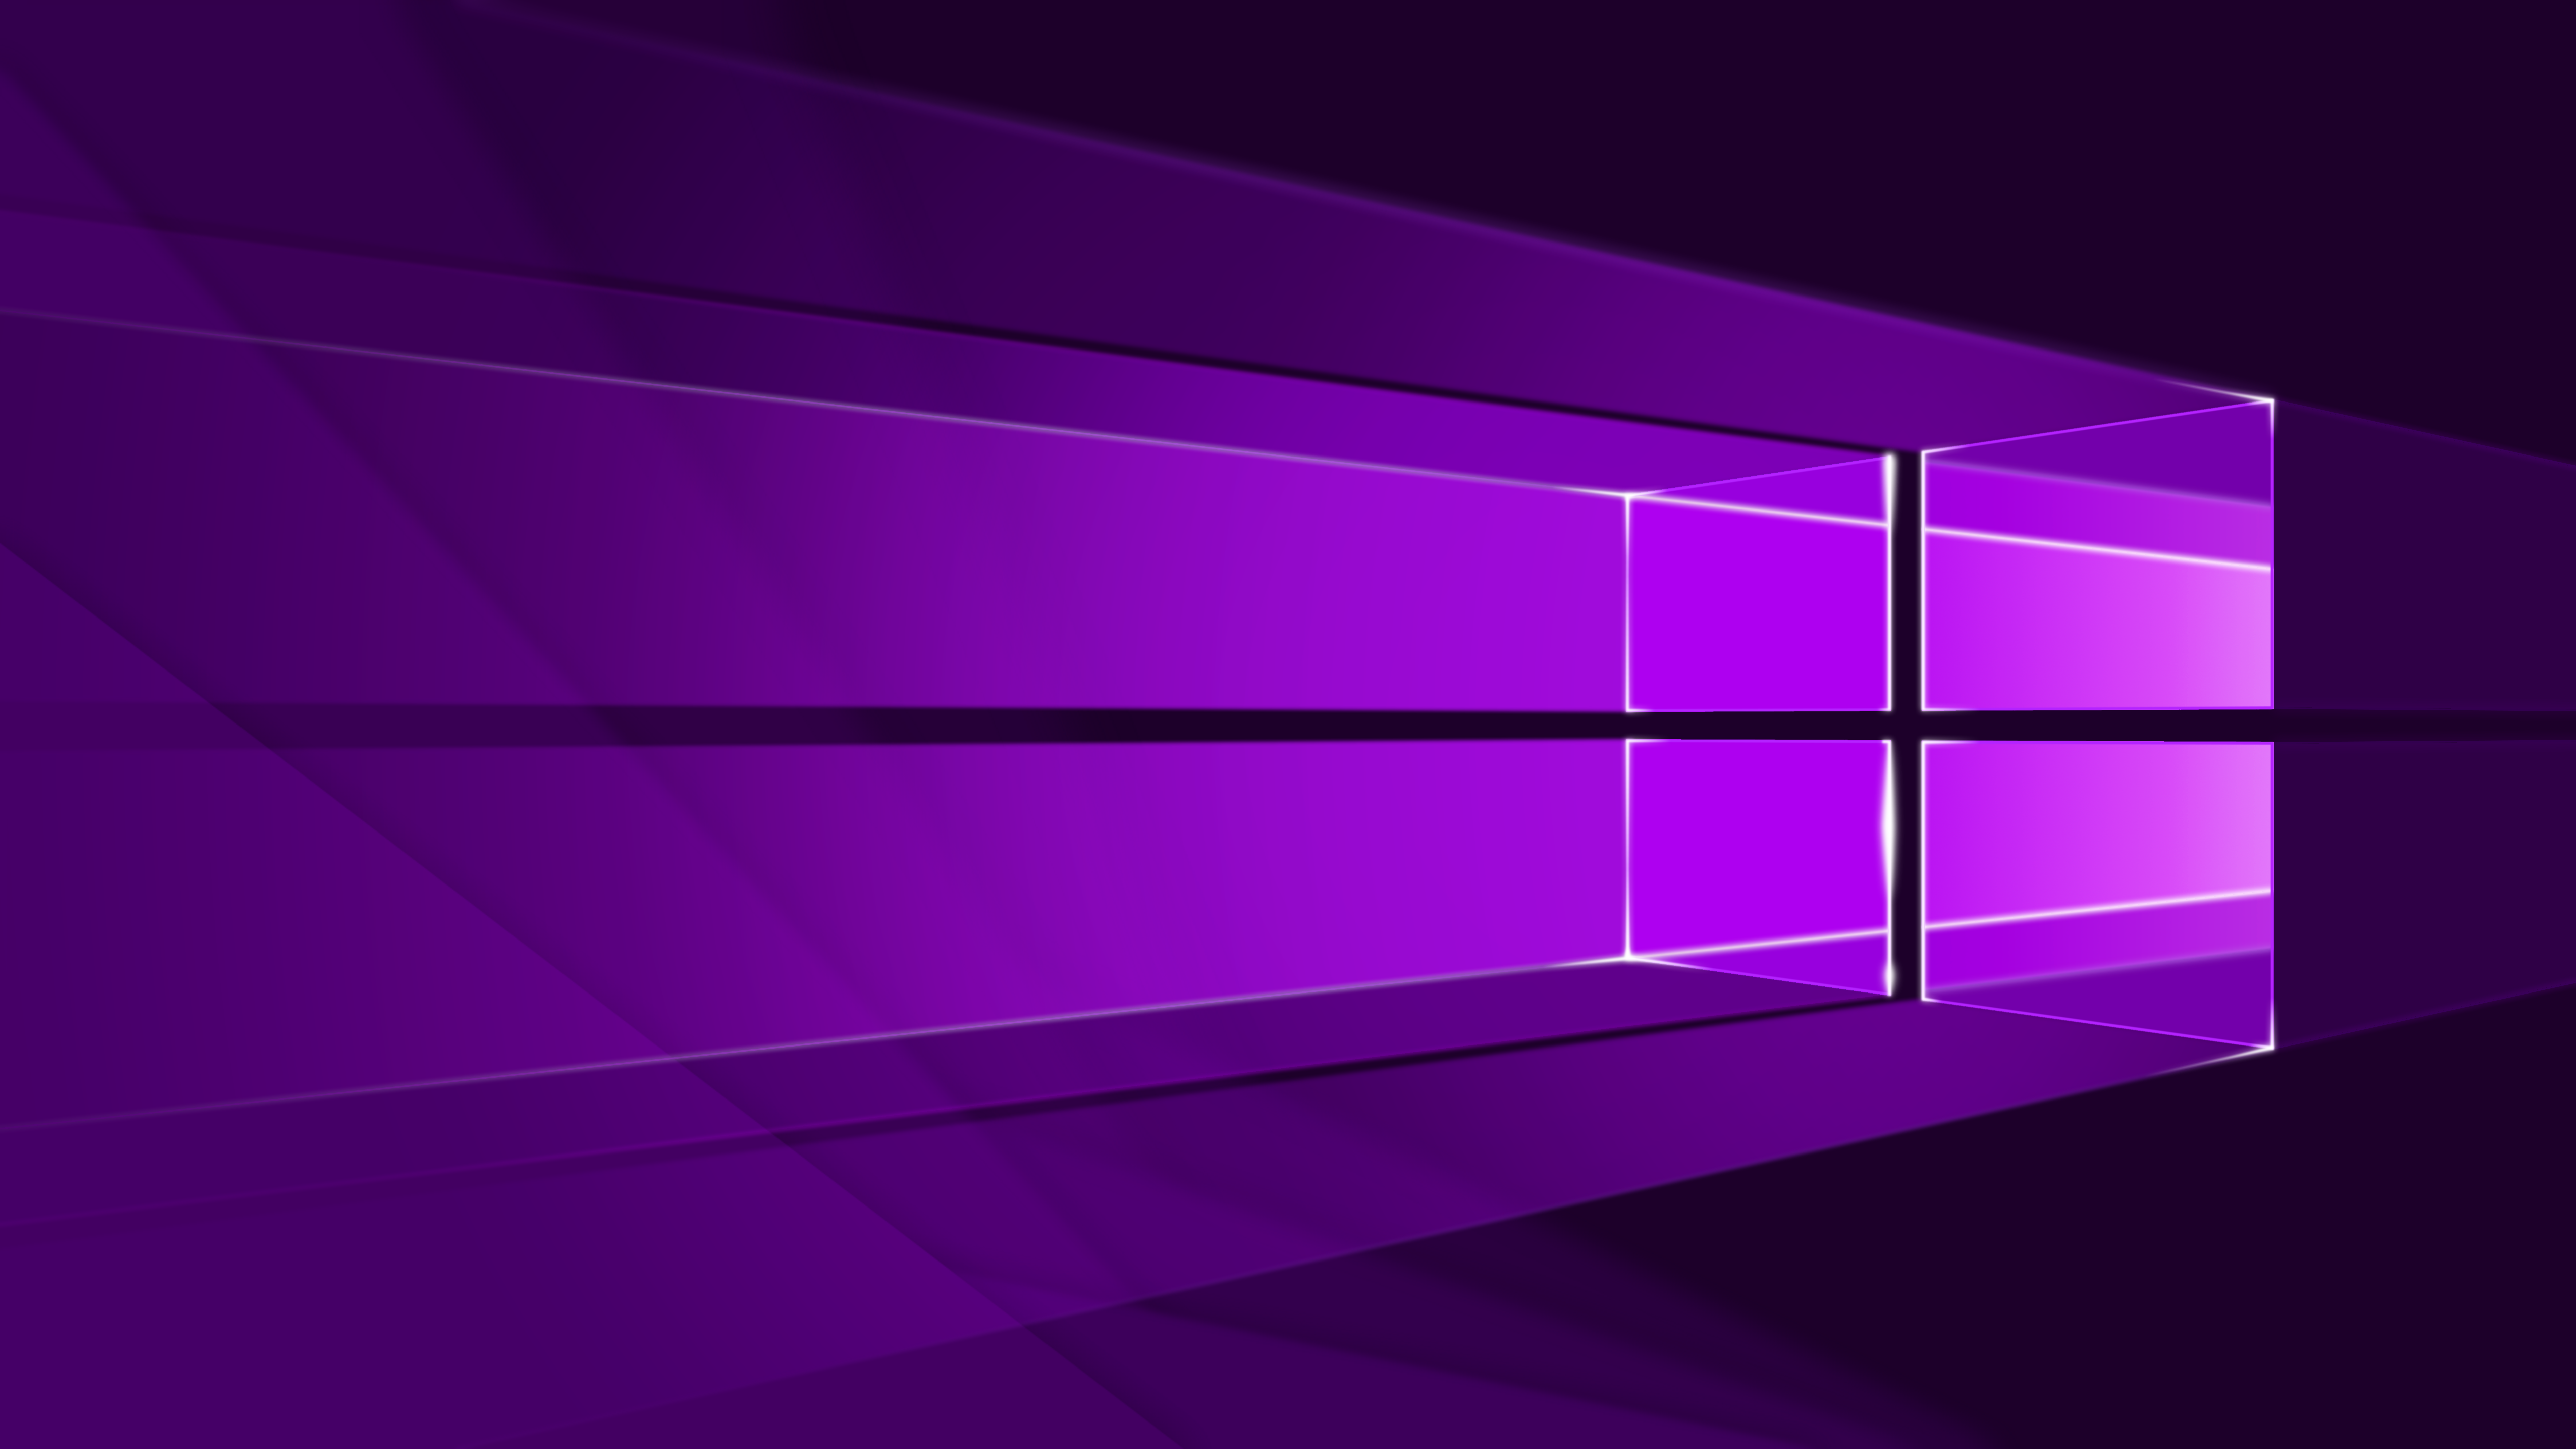 Windows 8 Official Wallpaper Purple The Ten [Windows 10 Wa...